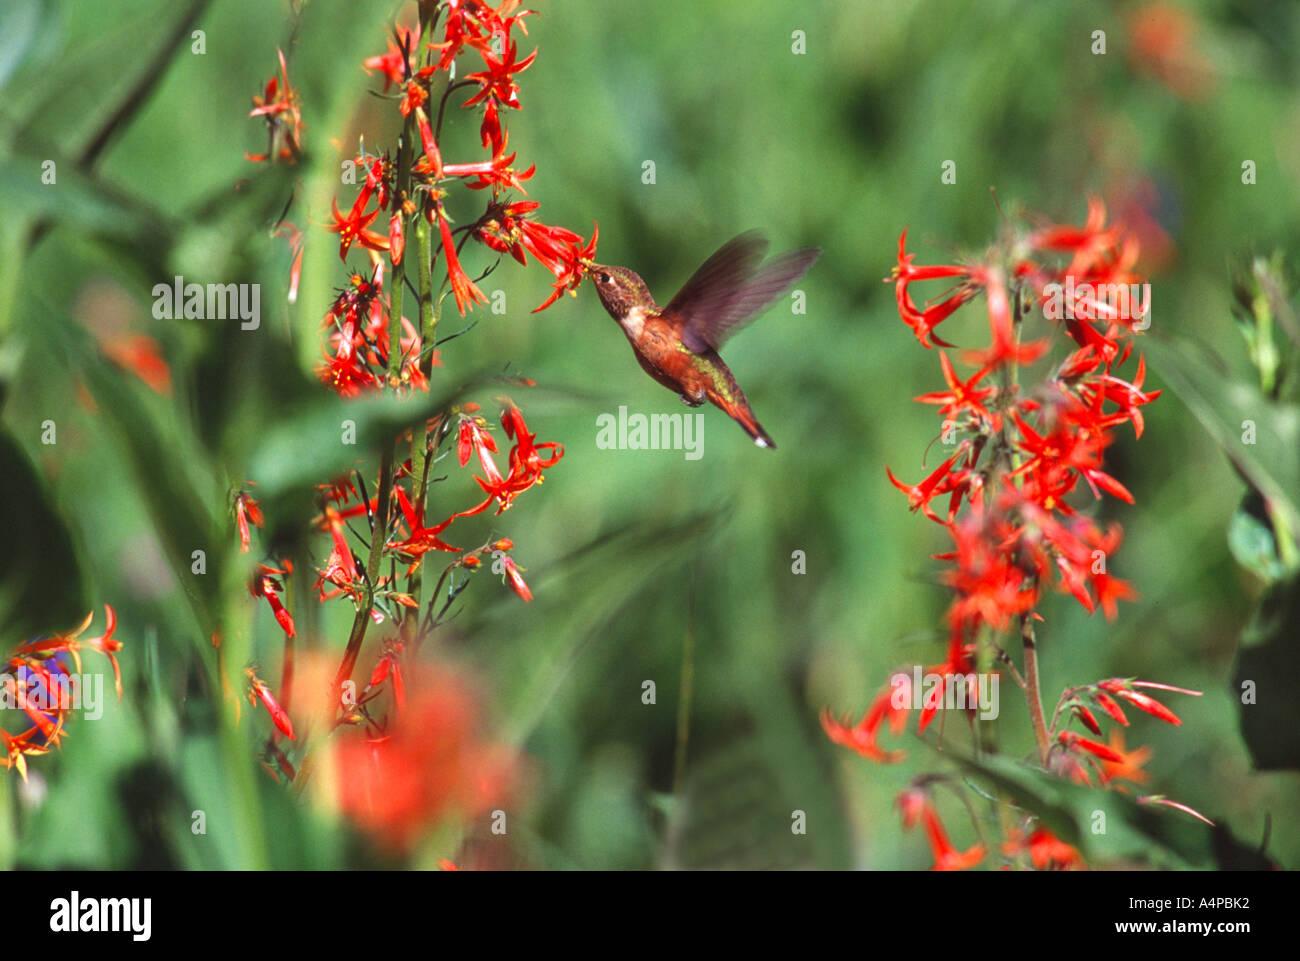 Stock Photo Rufous Hummingbird taking nectar from Skyrocket Gilia Blair Meadows Willamette National forest Oregon - Stock Image